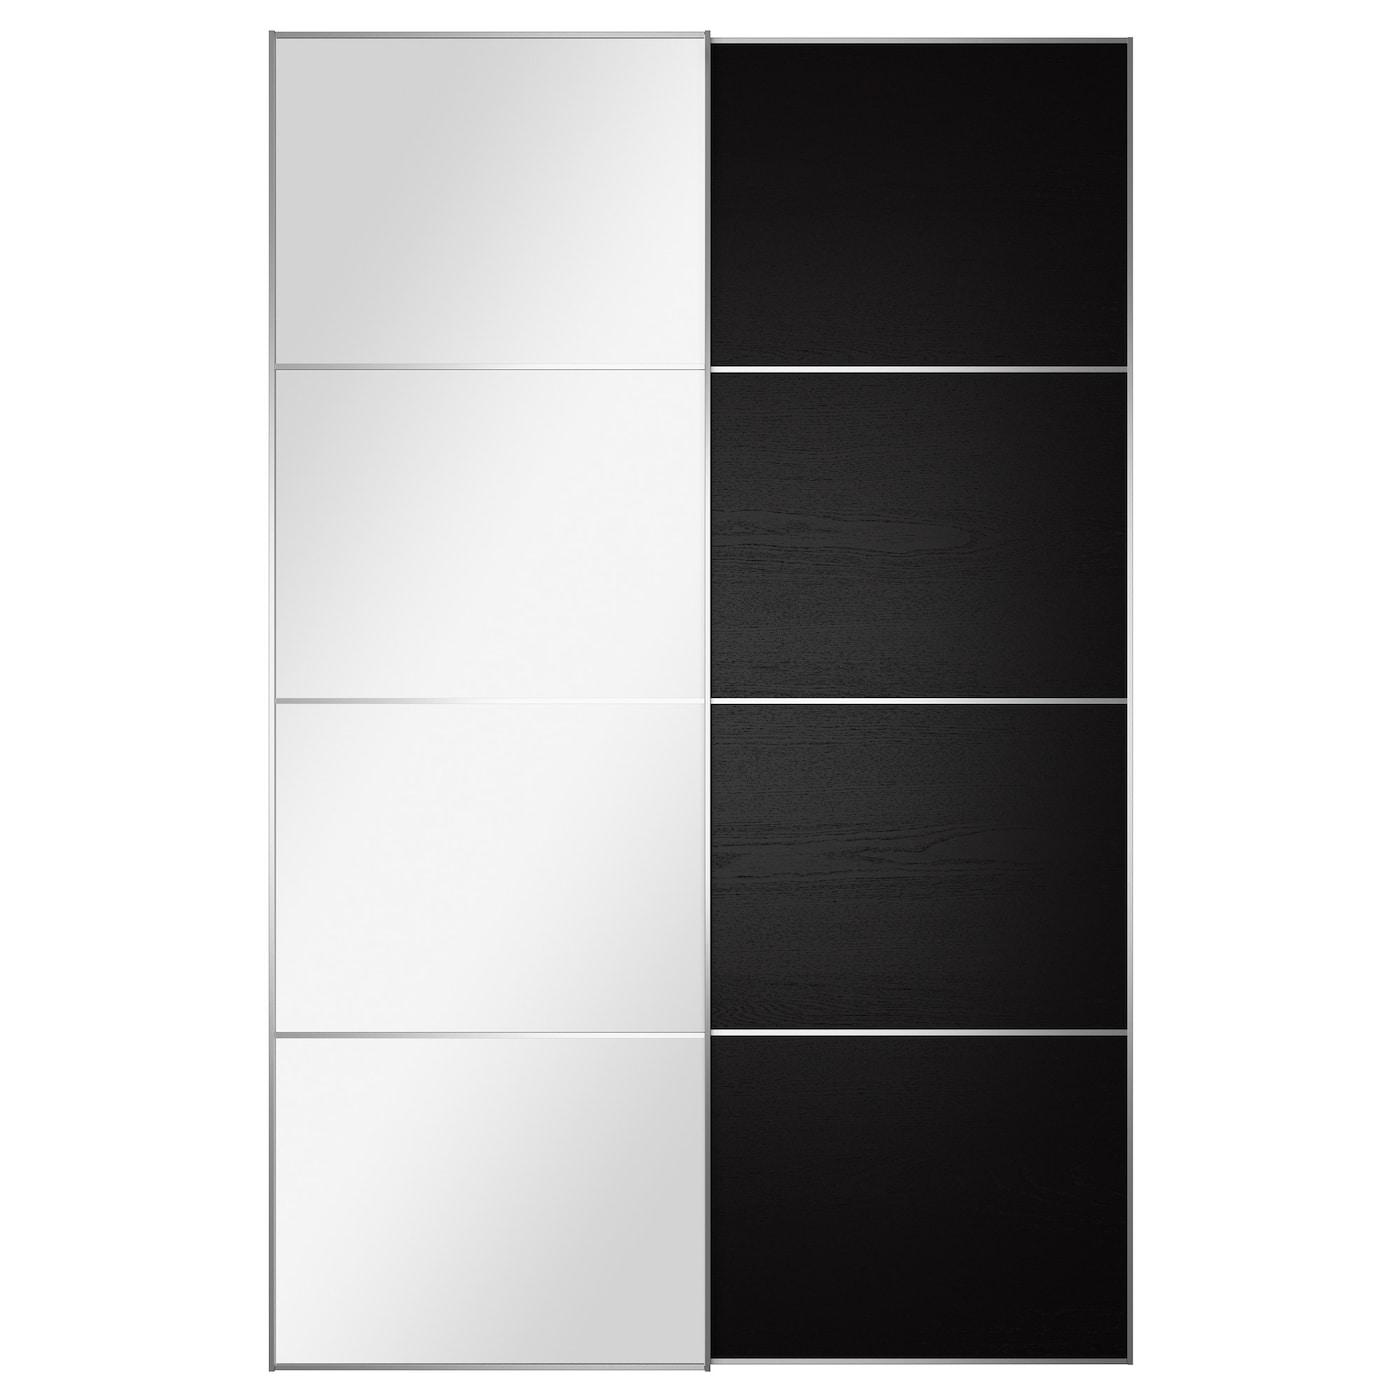 AULI ILSENG Pair of sliding doors Mirror glass black brown 150x236